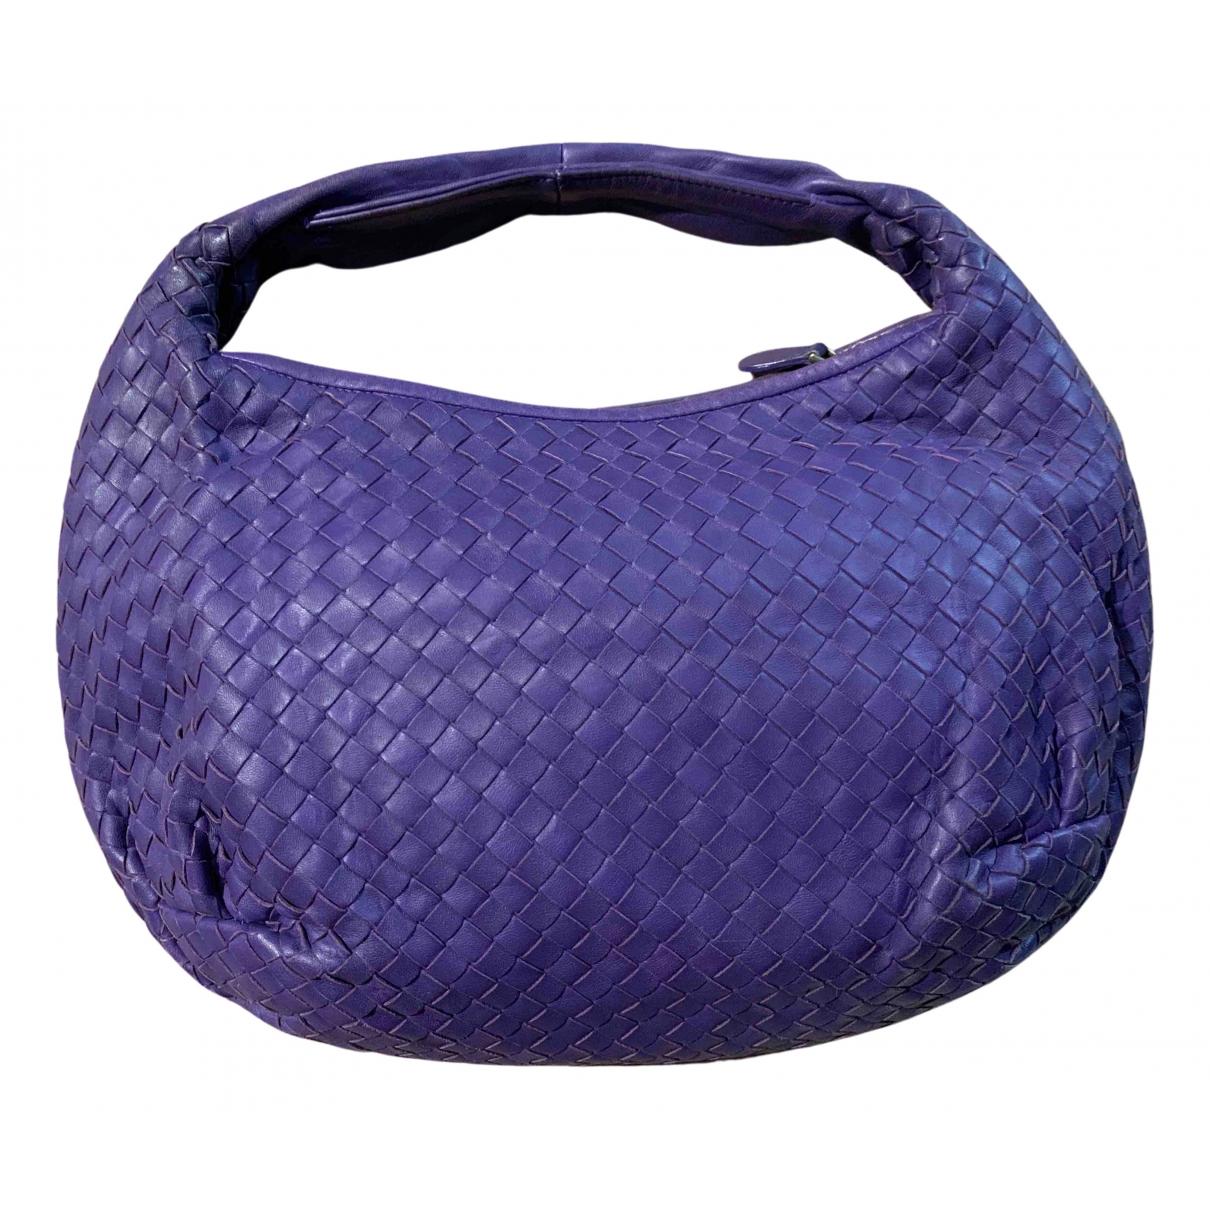 Bottega Veneta - Sac a main Veneta pour femme en cuir - violet